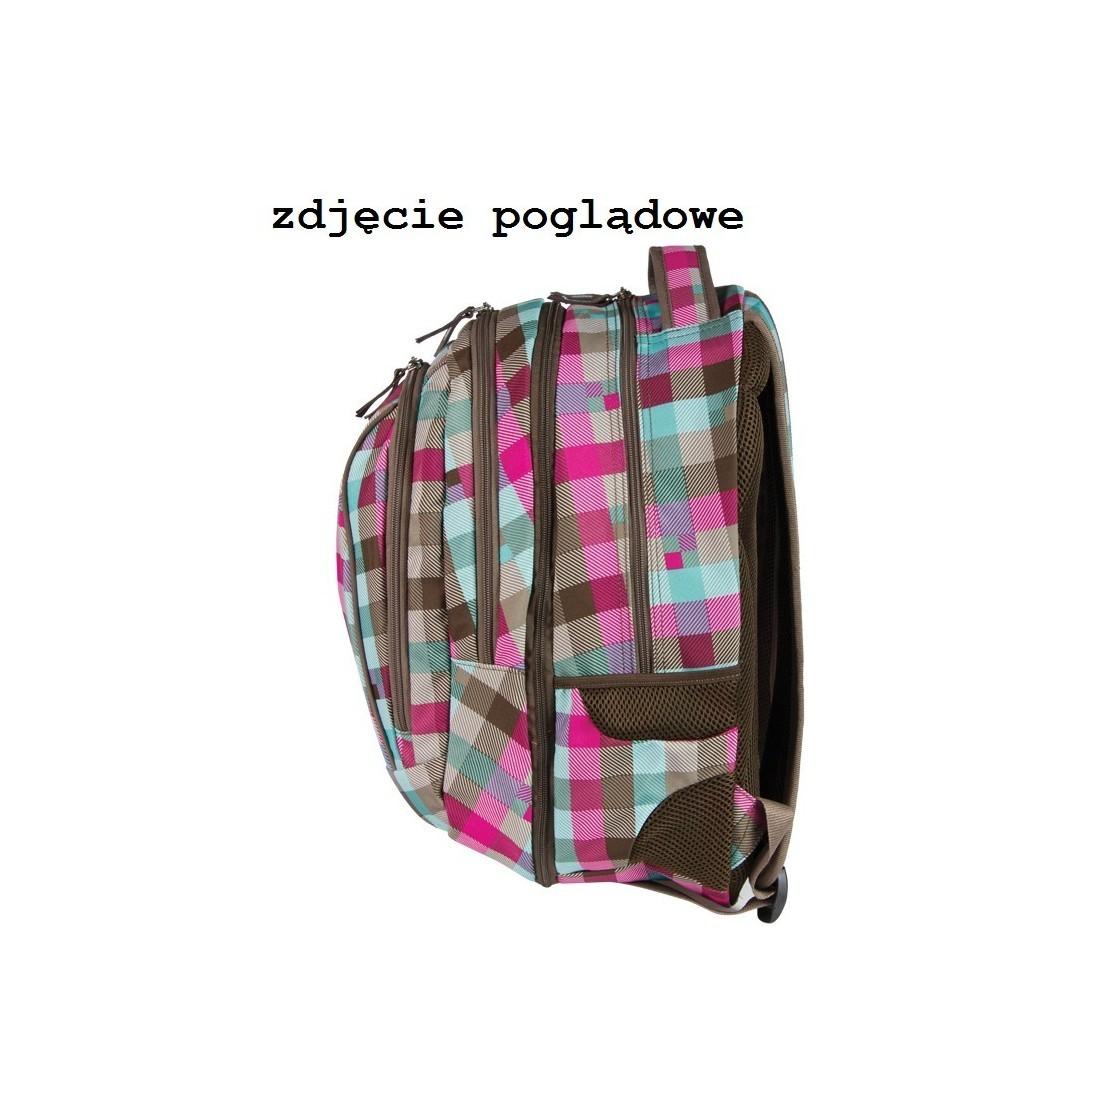 PLECAK MŁODZIEŻOWY COOLPACK 2w1 COMBO RUBIN 102 - kratka - plecak-tornister.pl